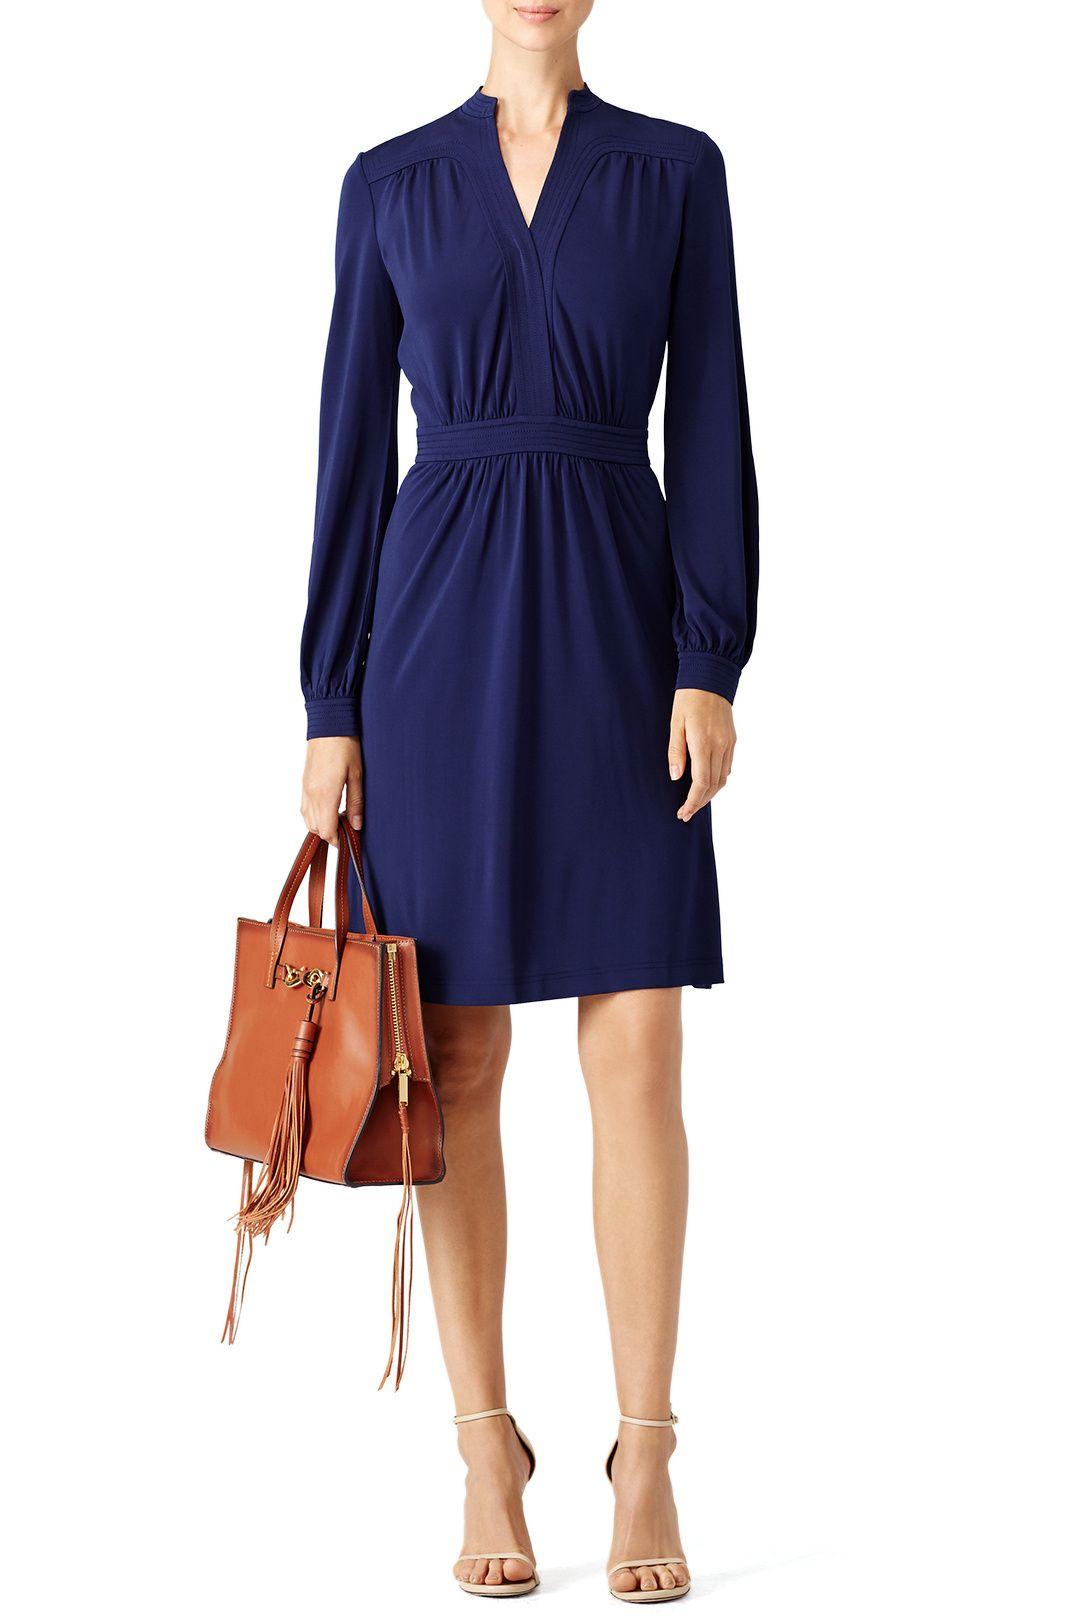 Valentina tunic dress sewing inspiration pinterest